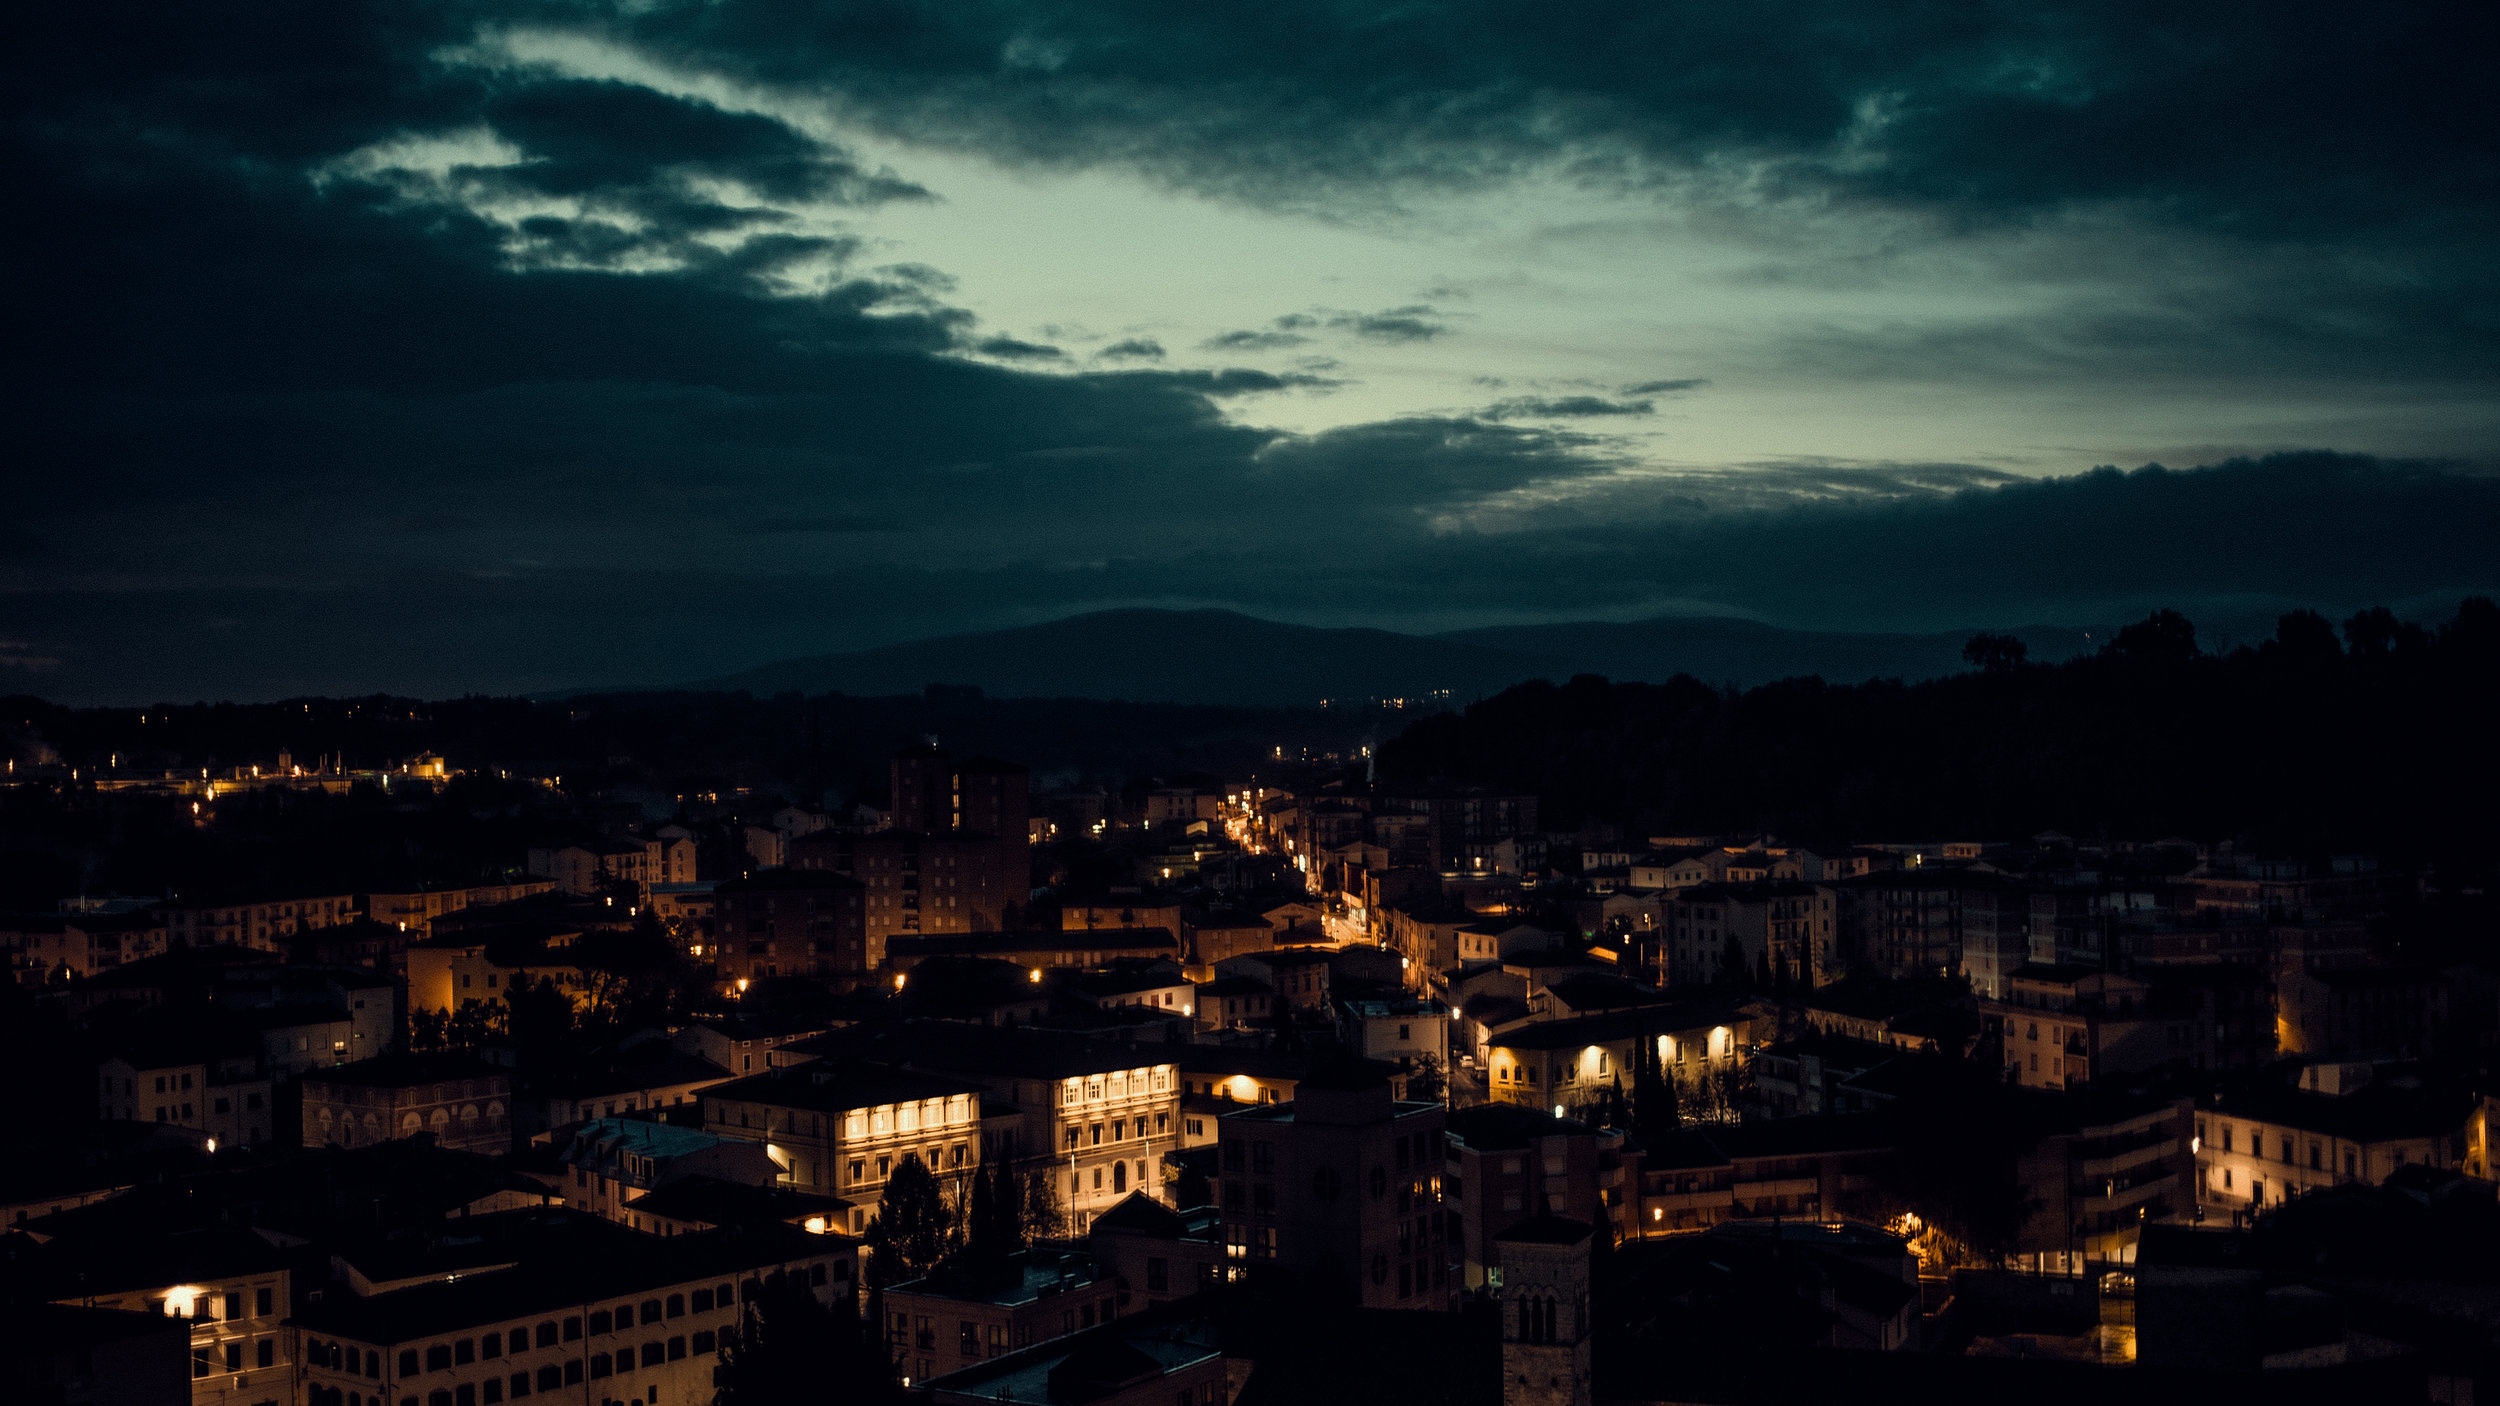 City_Night-2.jpg